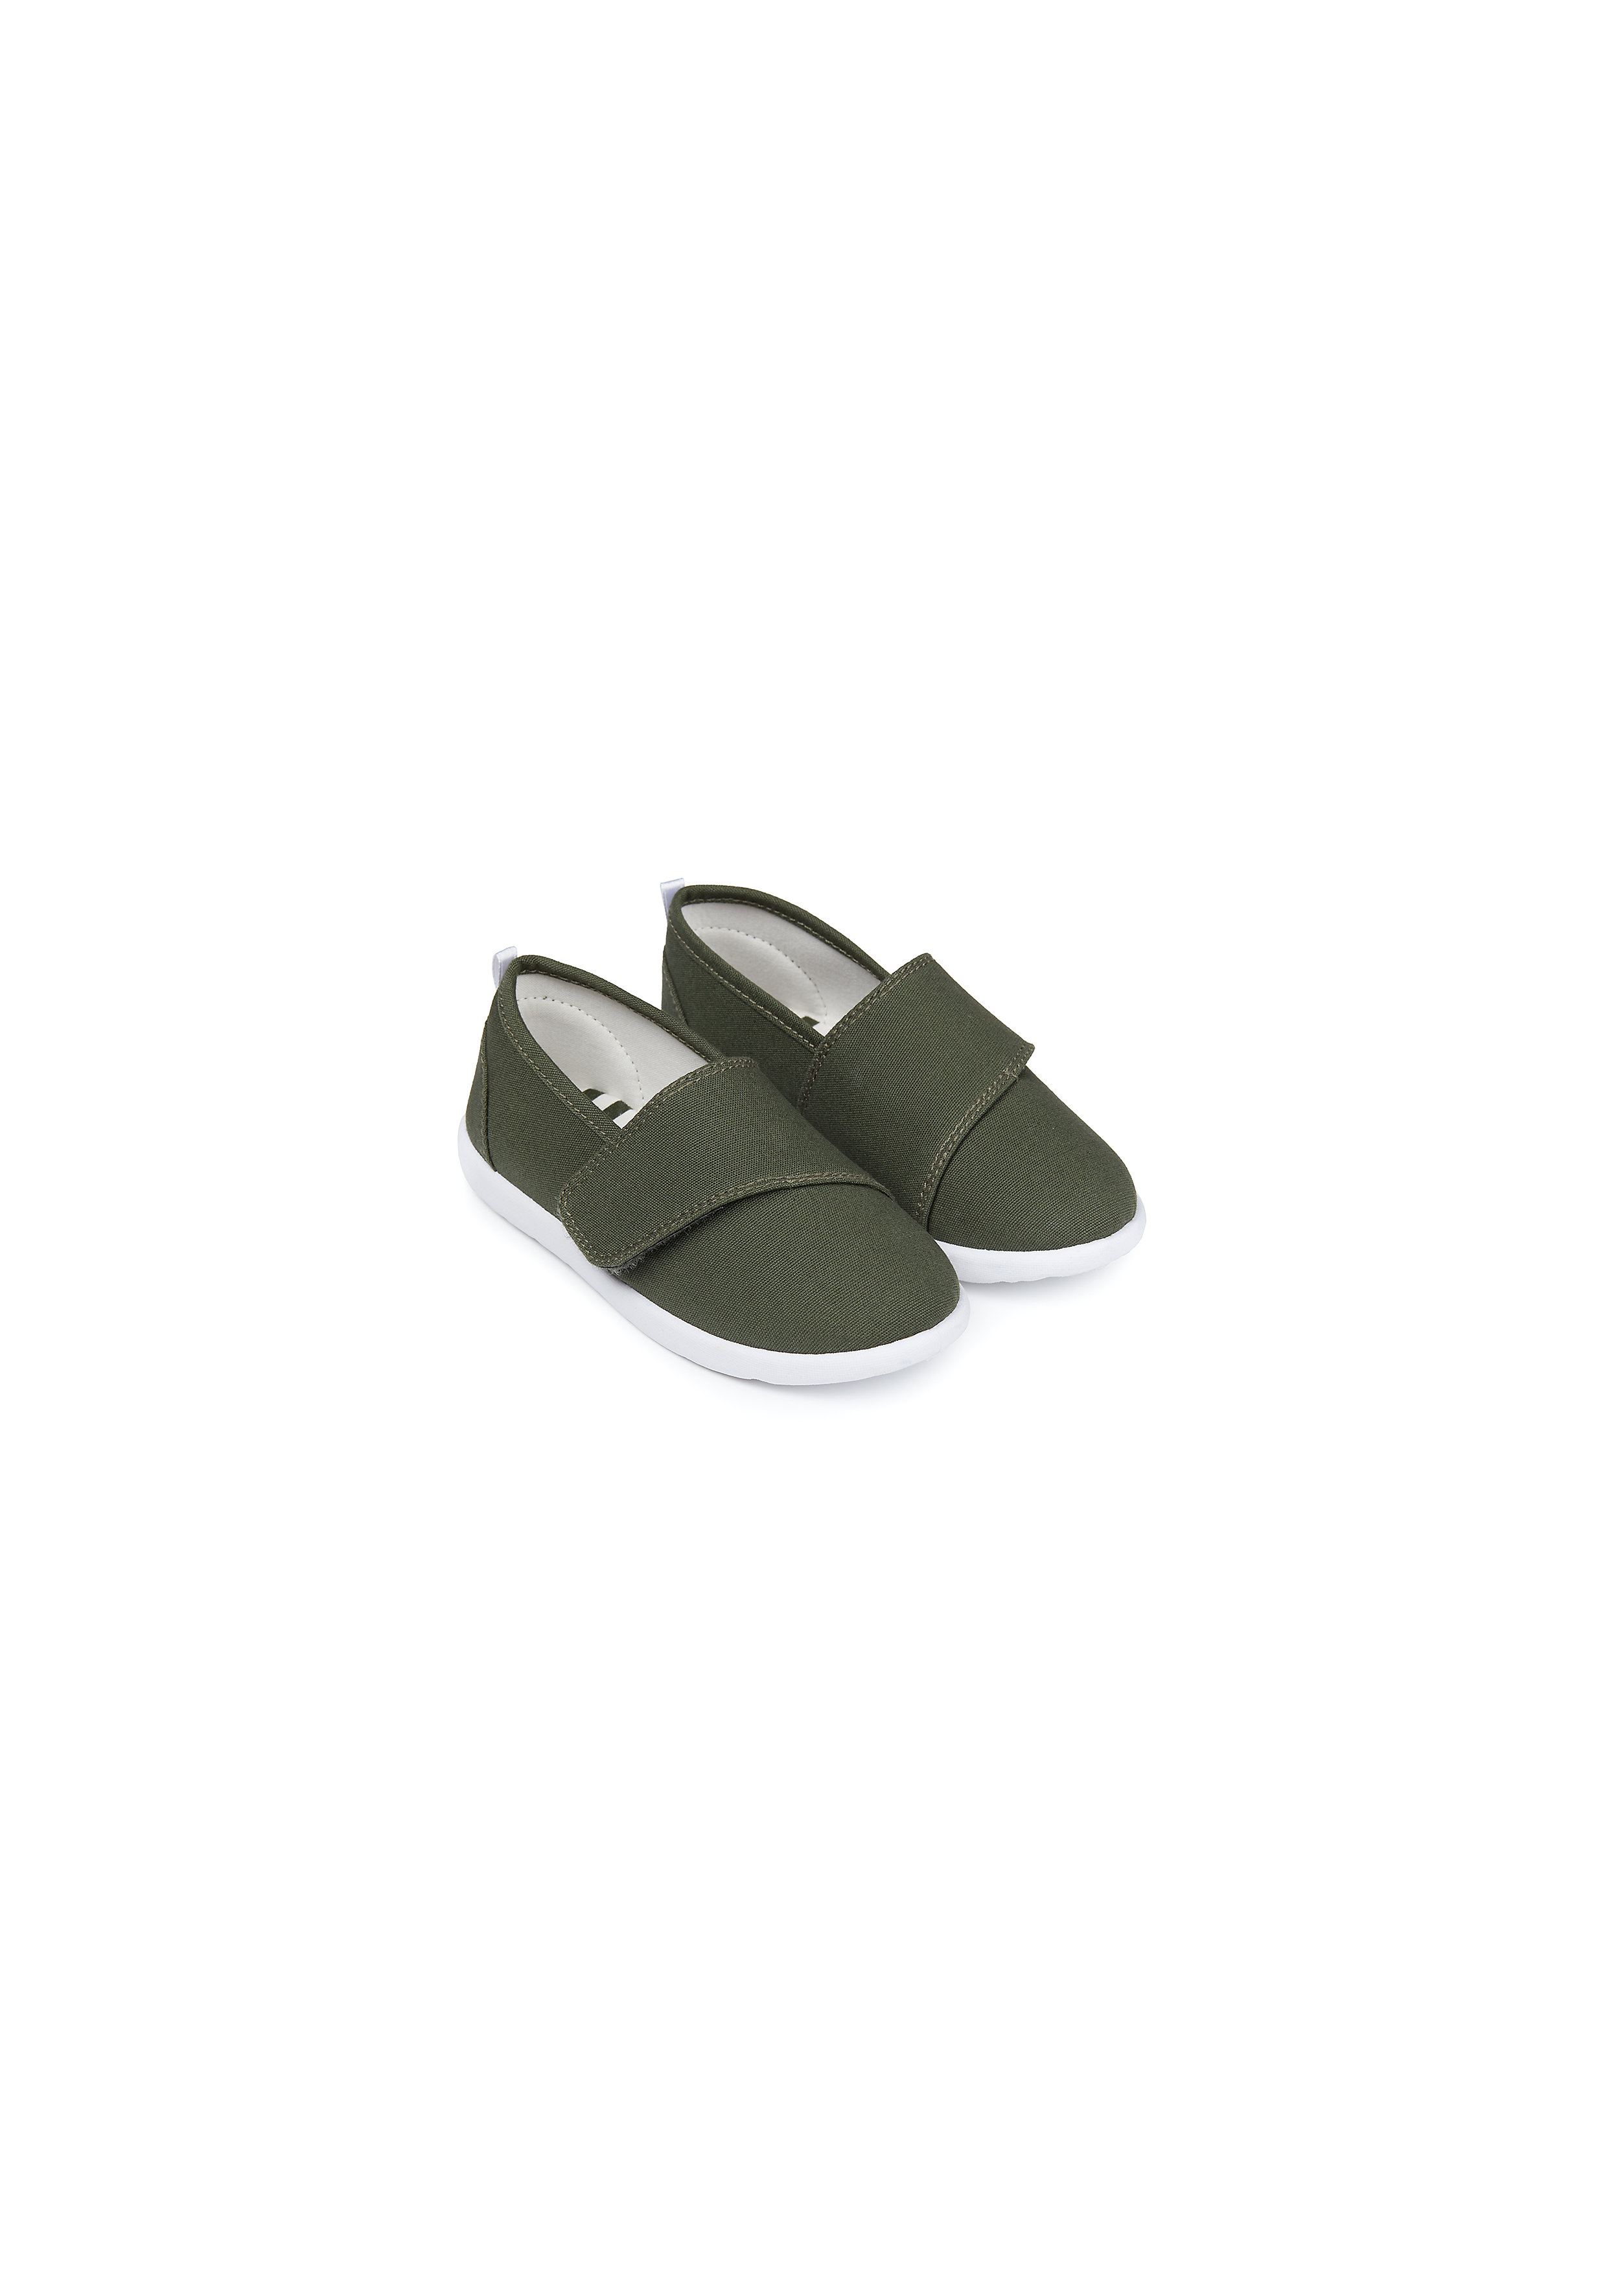 Mothercare | Boys Canvas Shoes  - Khaki